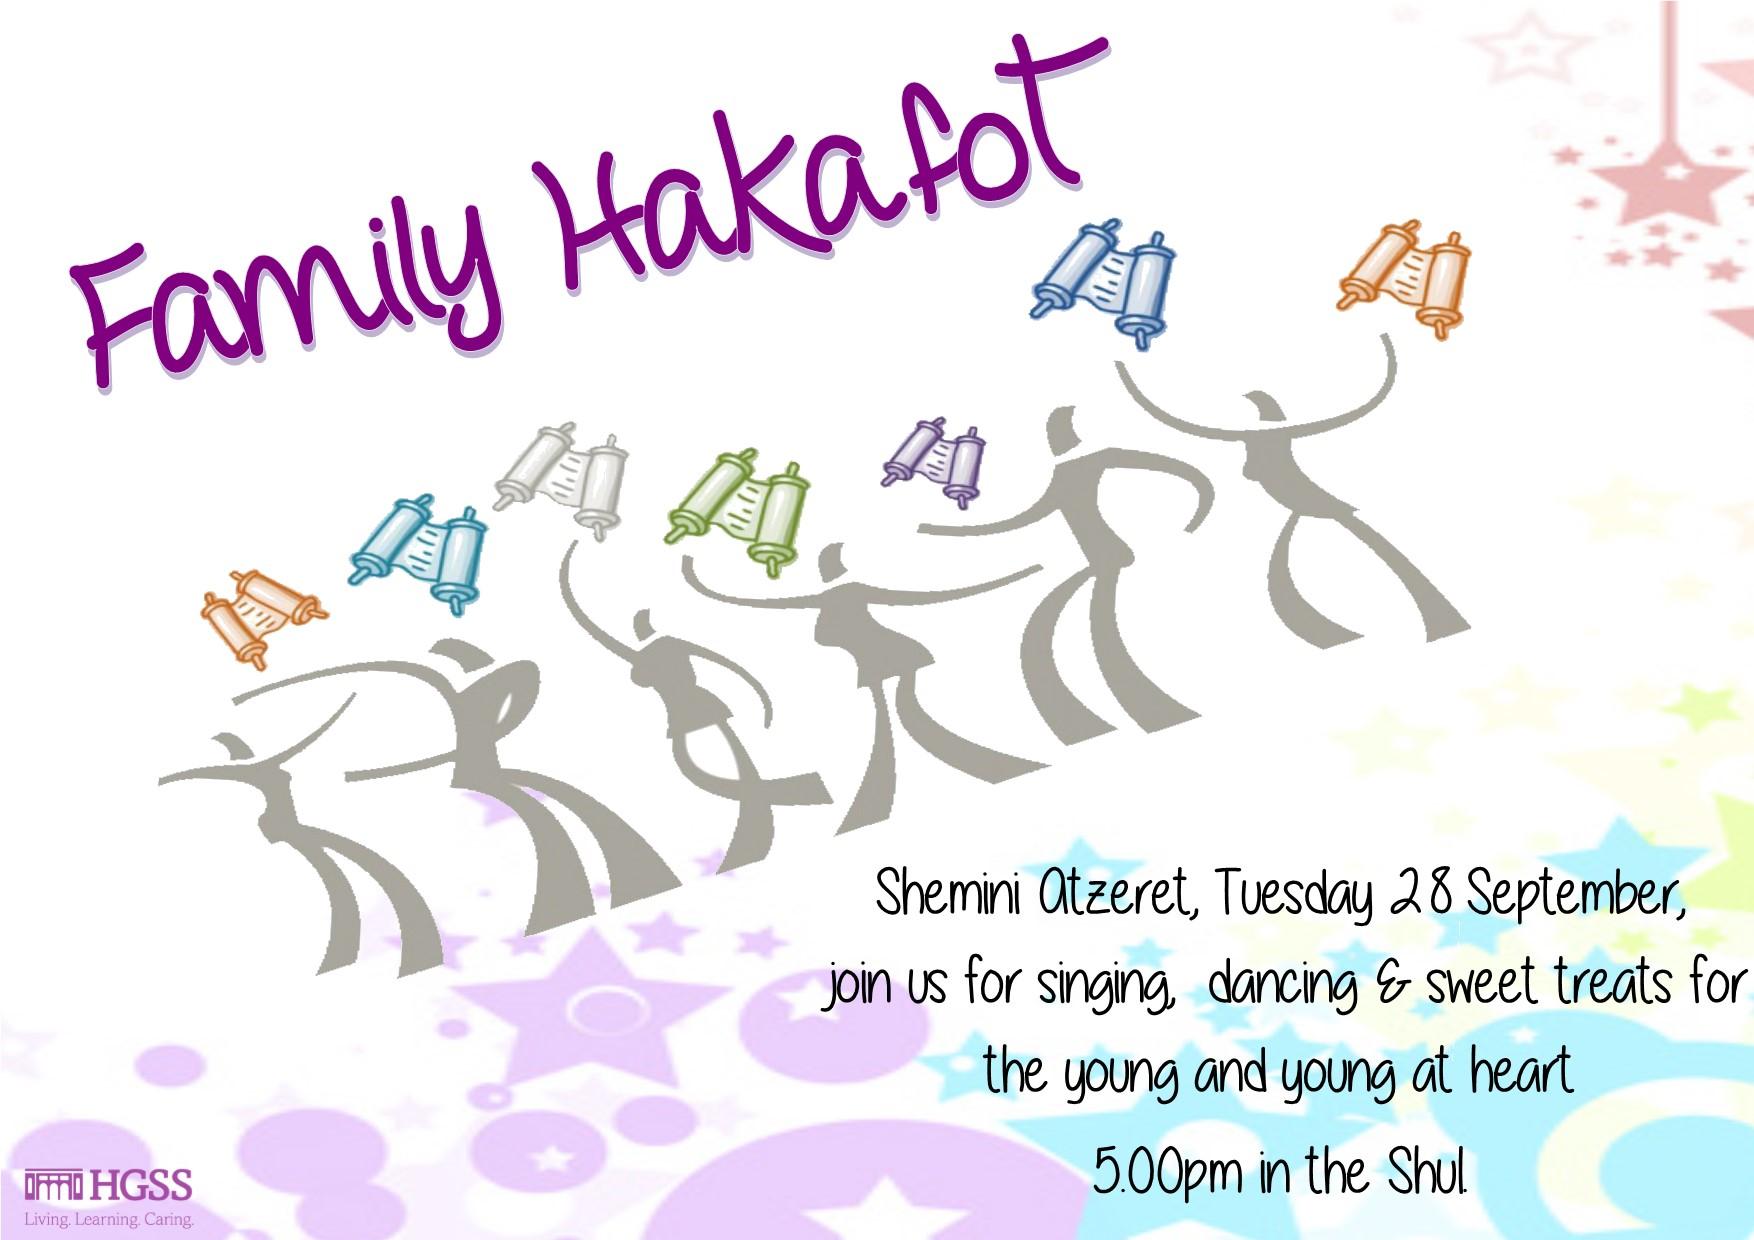 Family Hakafot @ HGSS